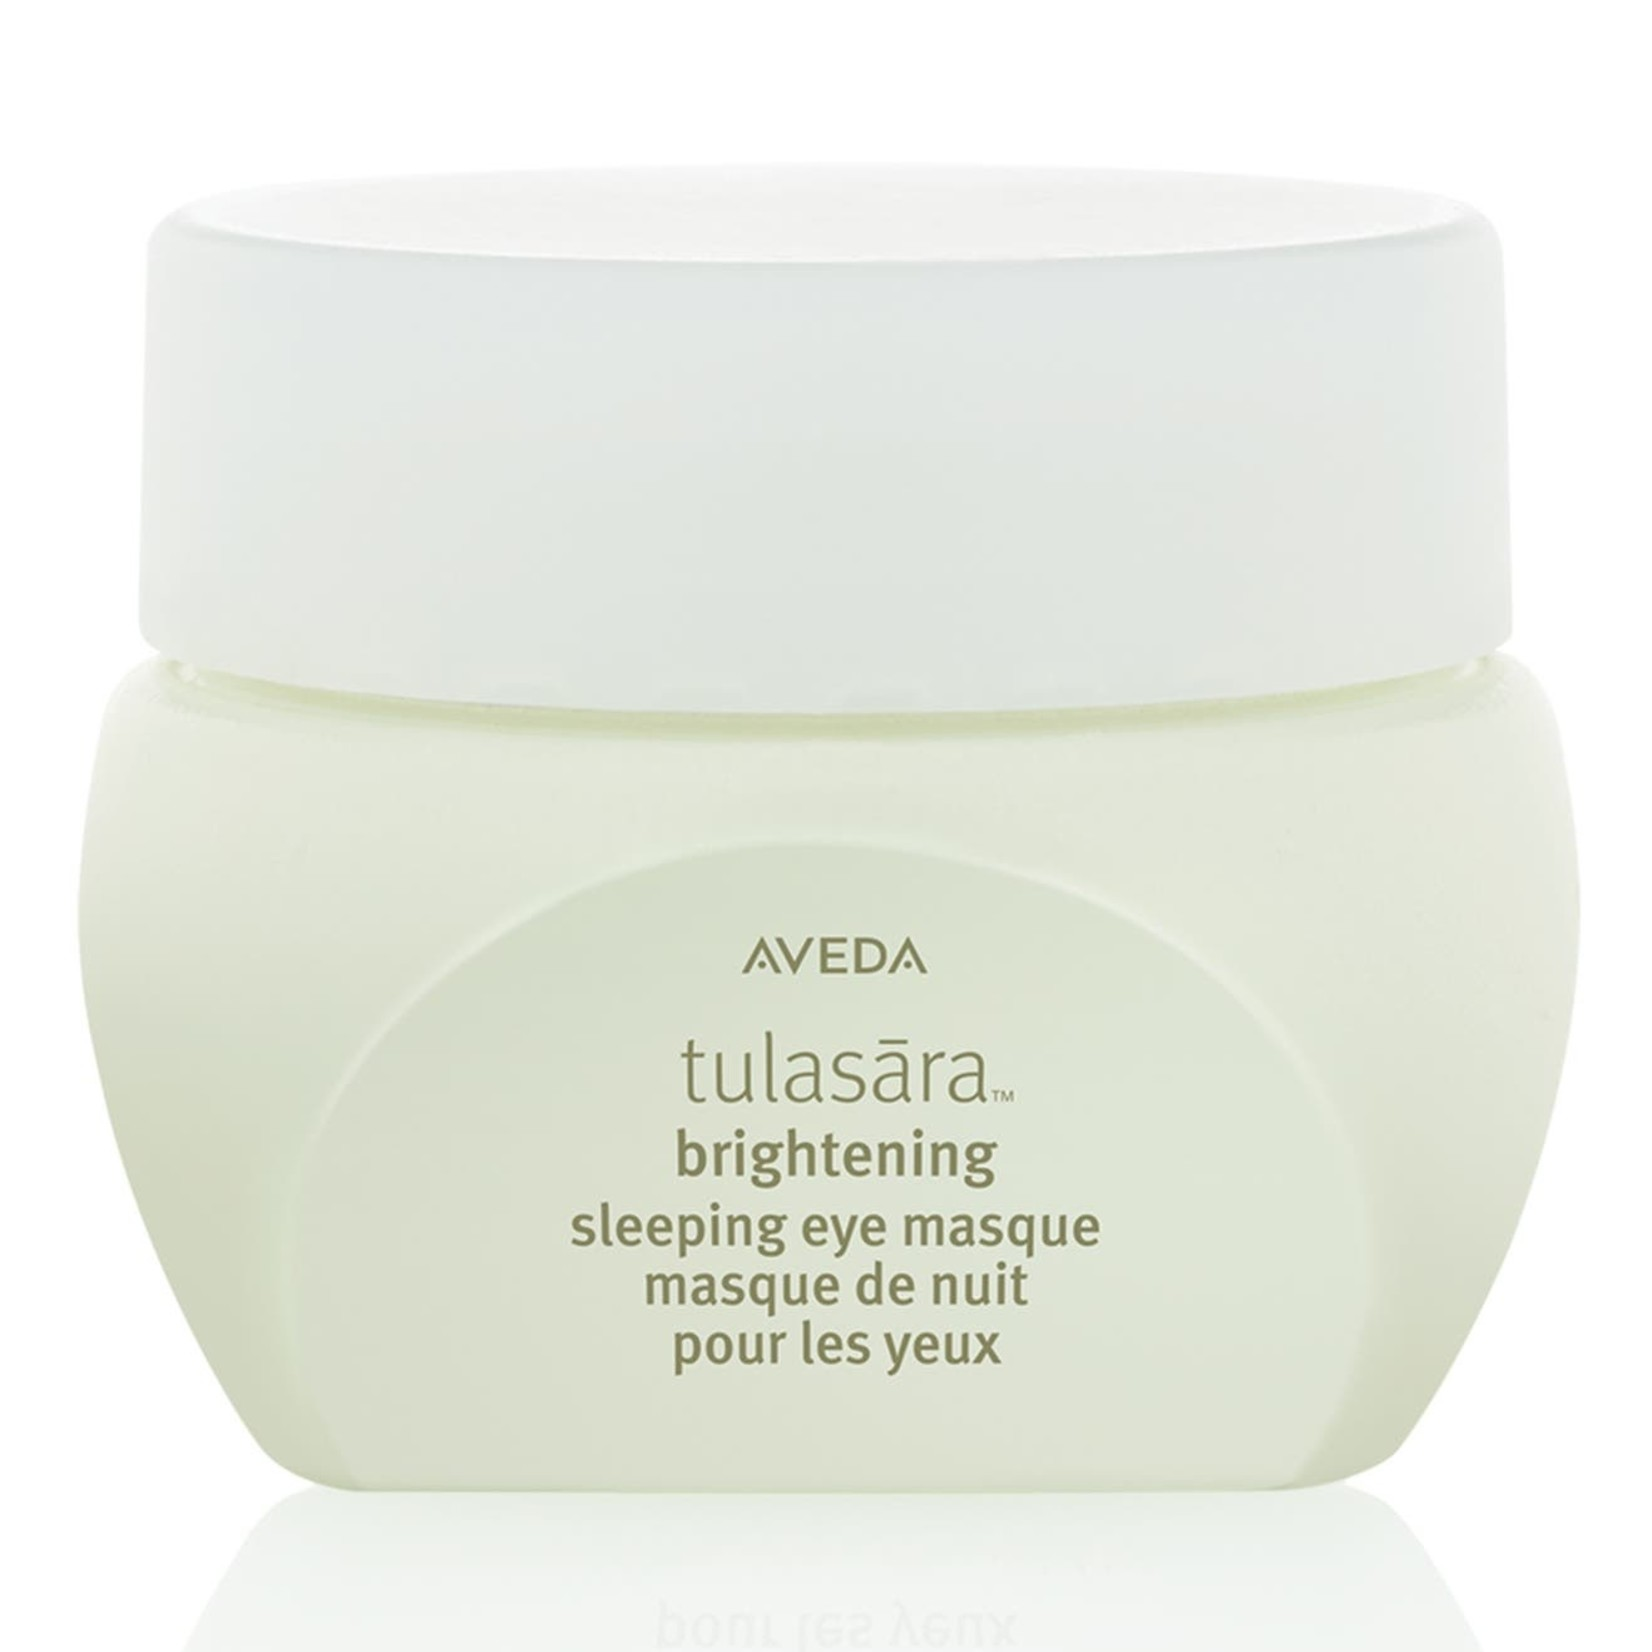 AVEDA Tulasāra™ Brightening Sleeping Eye Masque